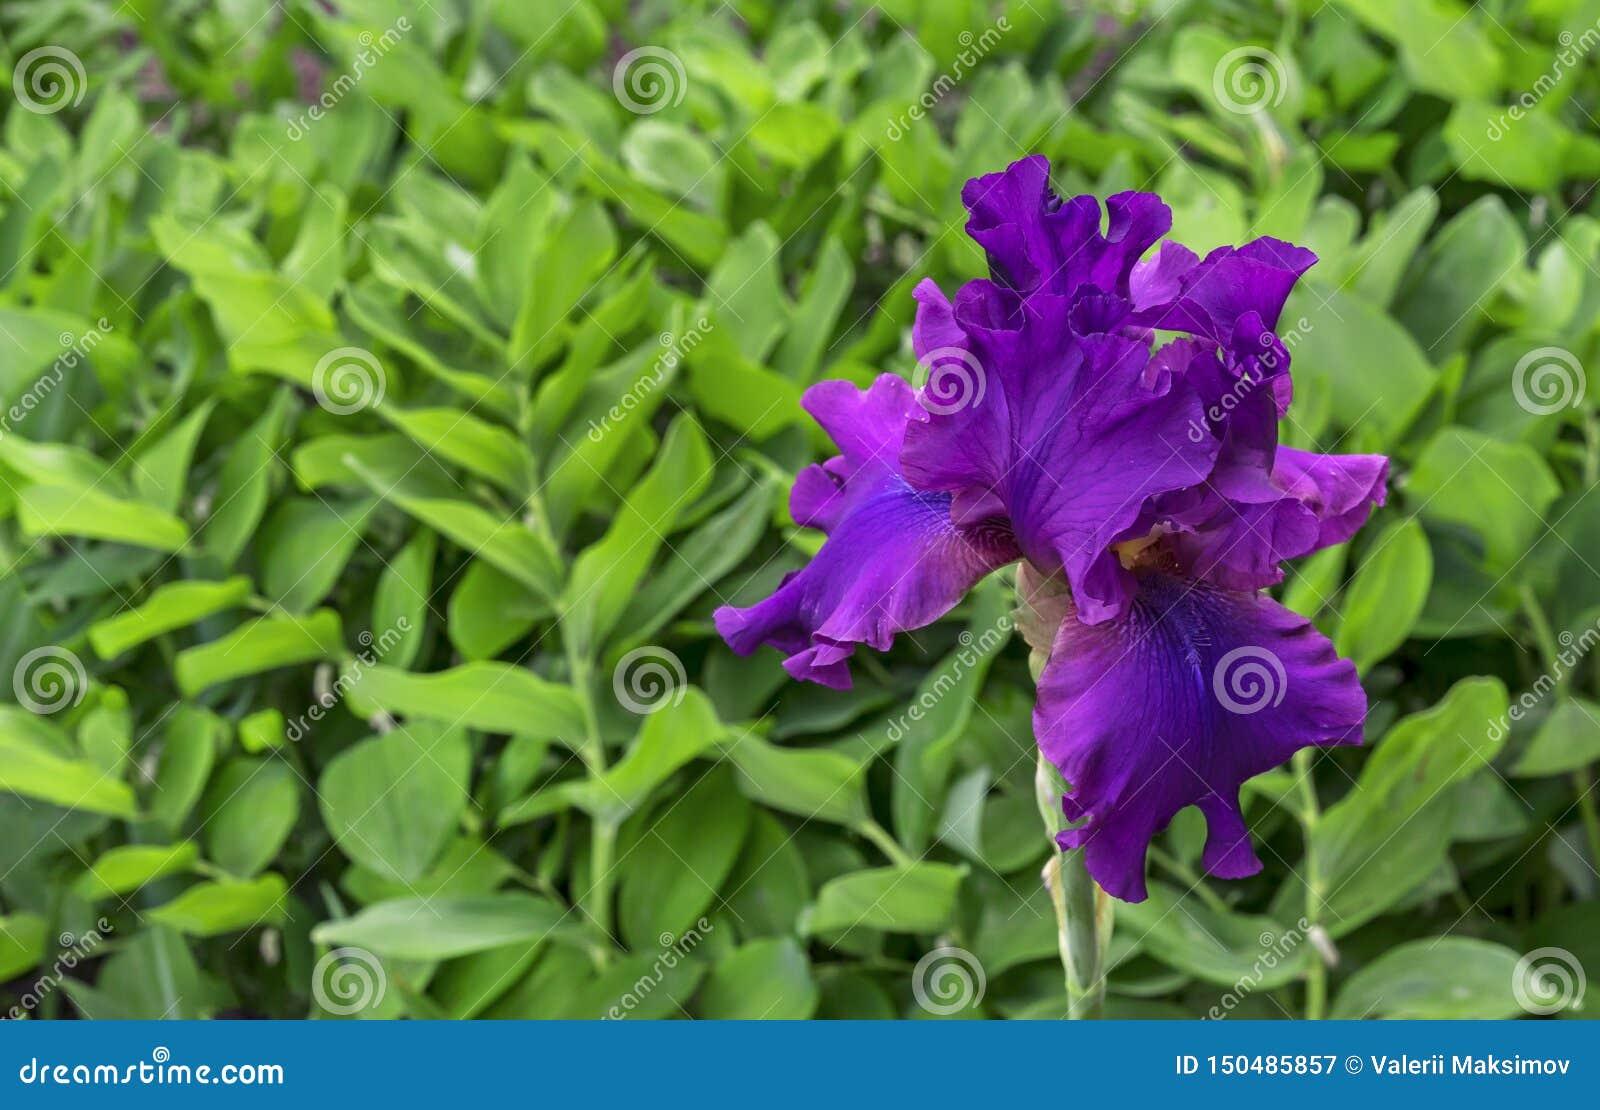 Iris flower. Blooming violet iris, perennial plant of the family Iridaceae